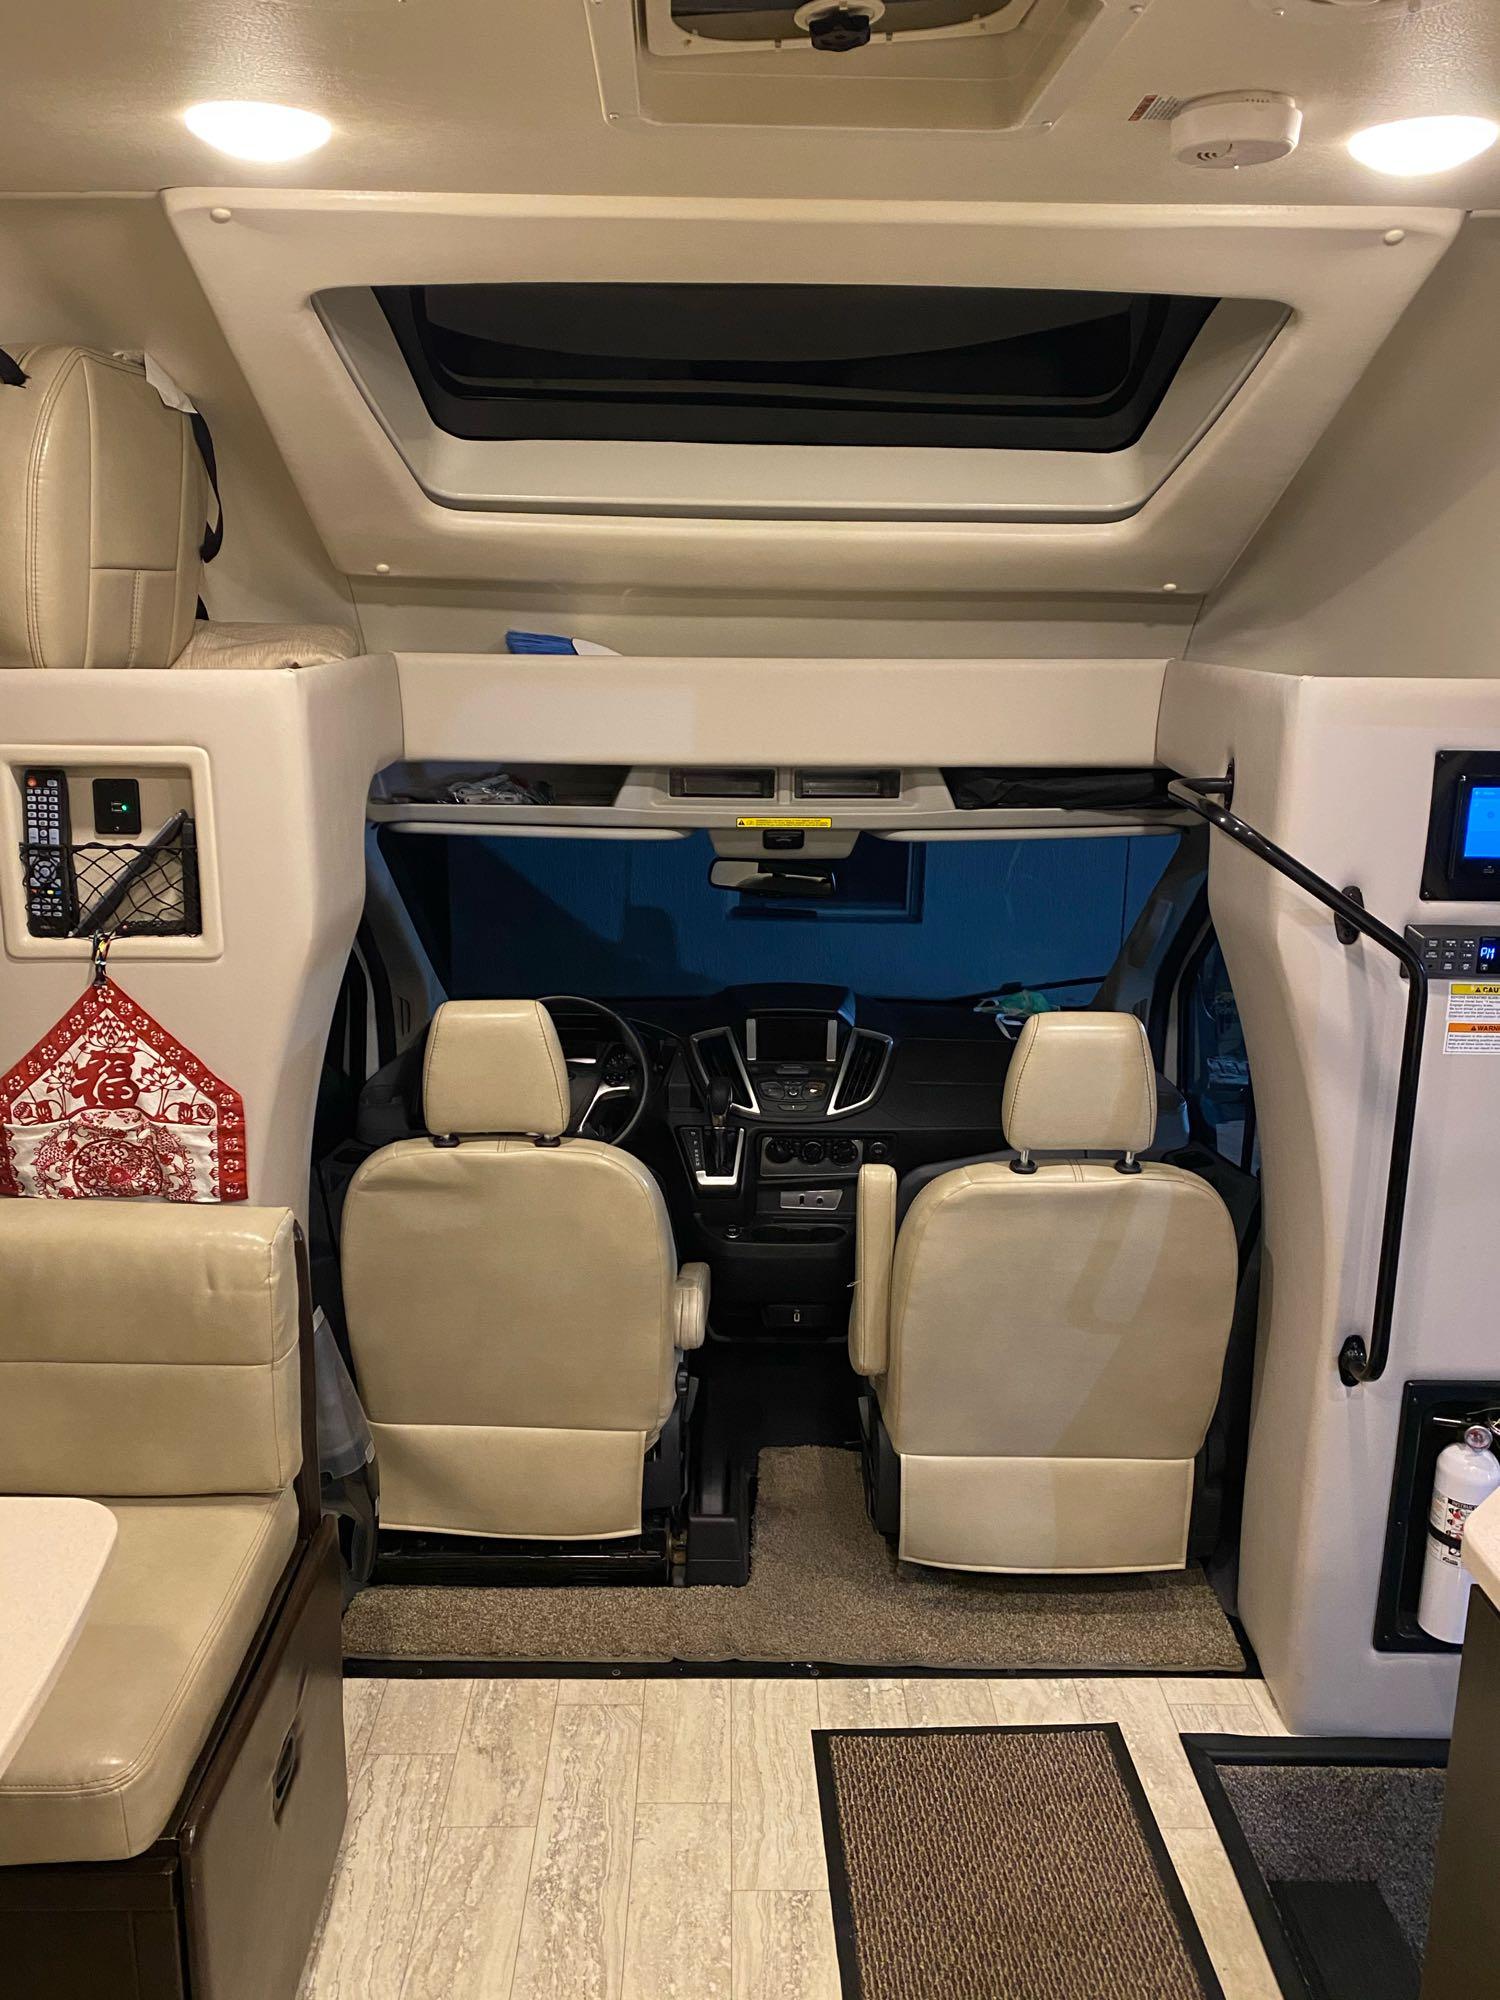 Passenger seat swivel to face living area. . Thor Motor Coach Gemini 23TK 2019